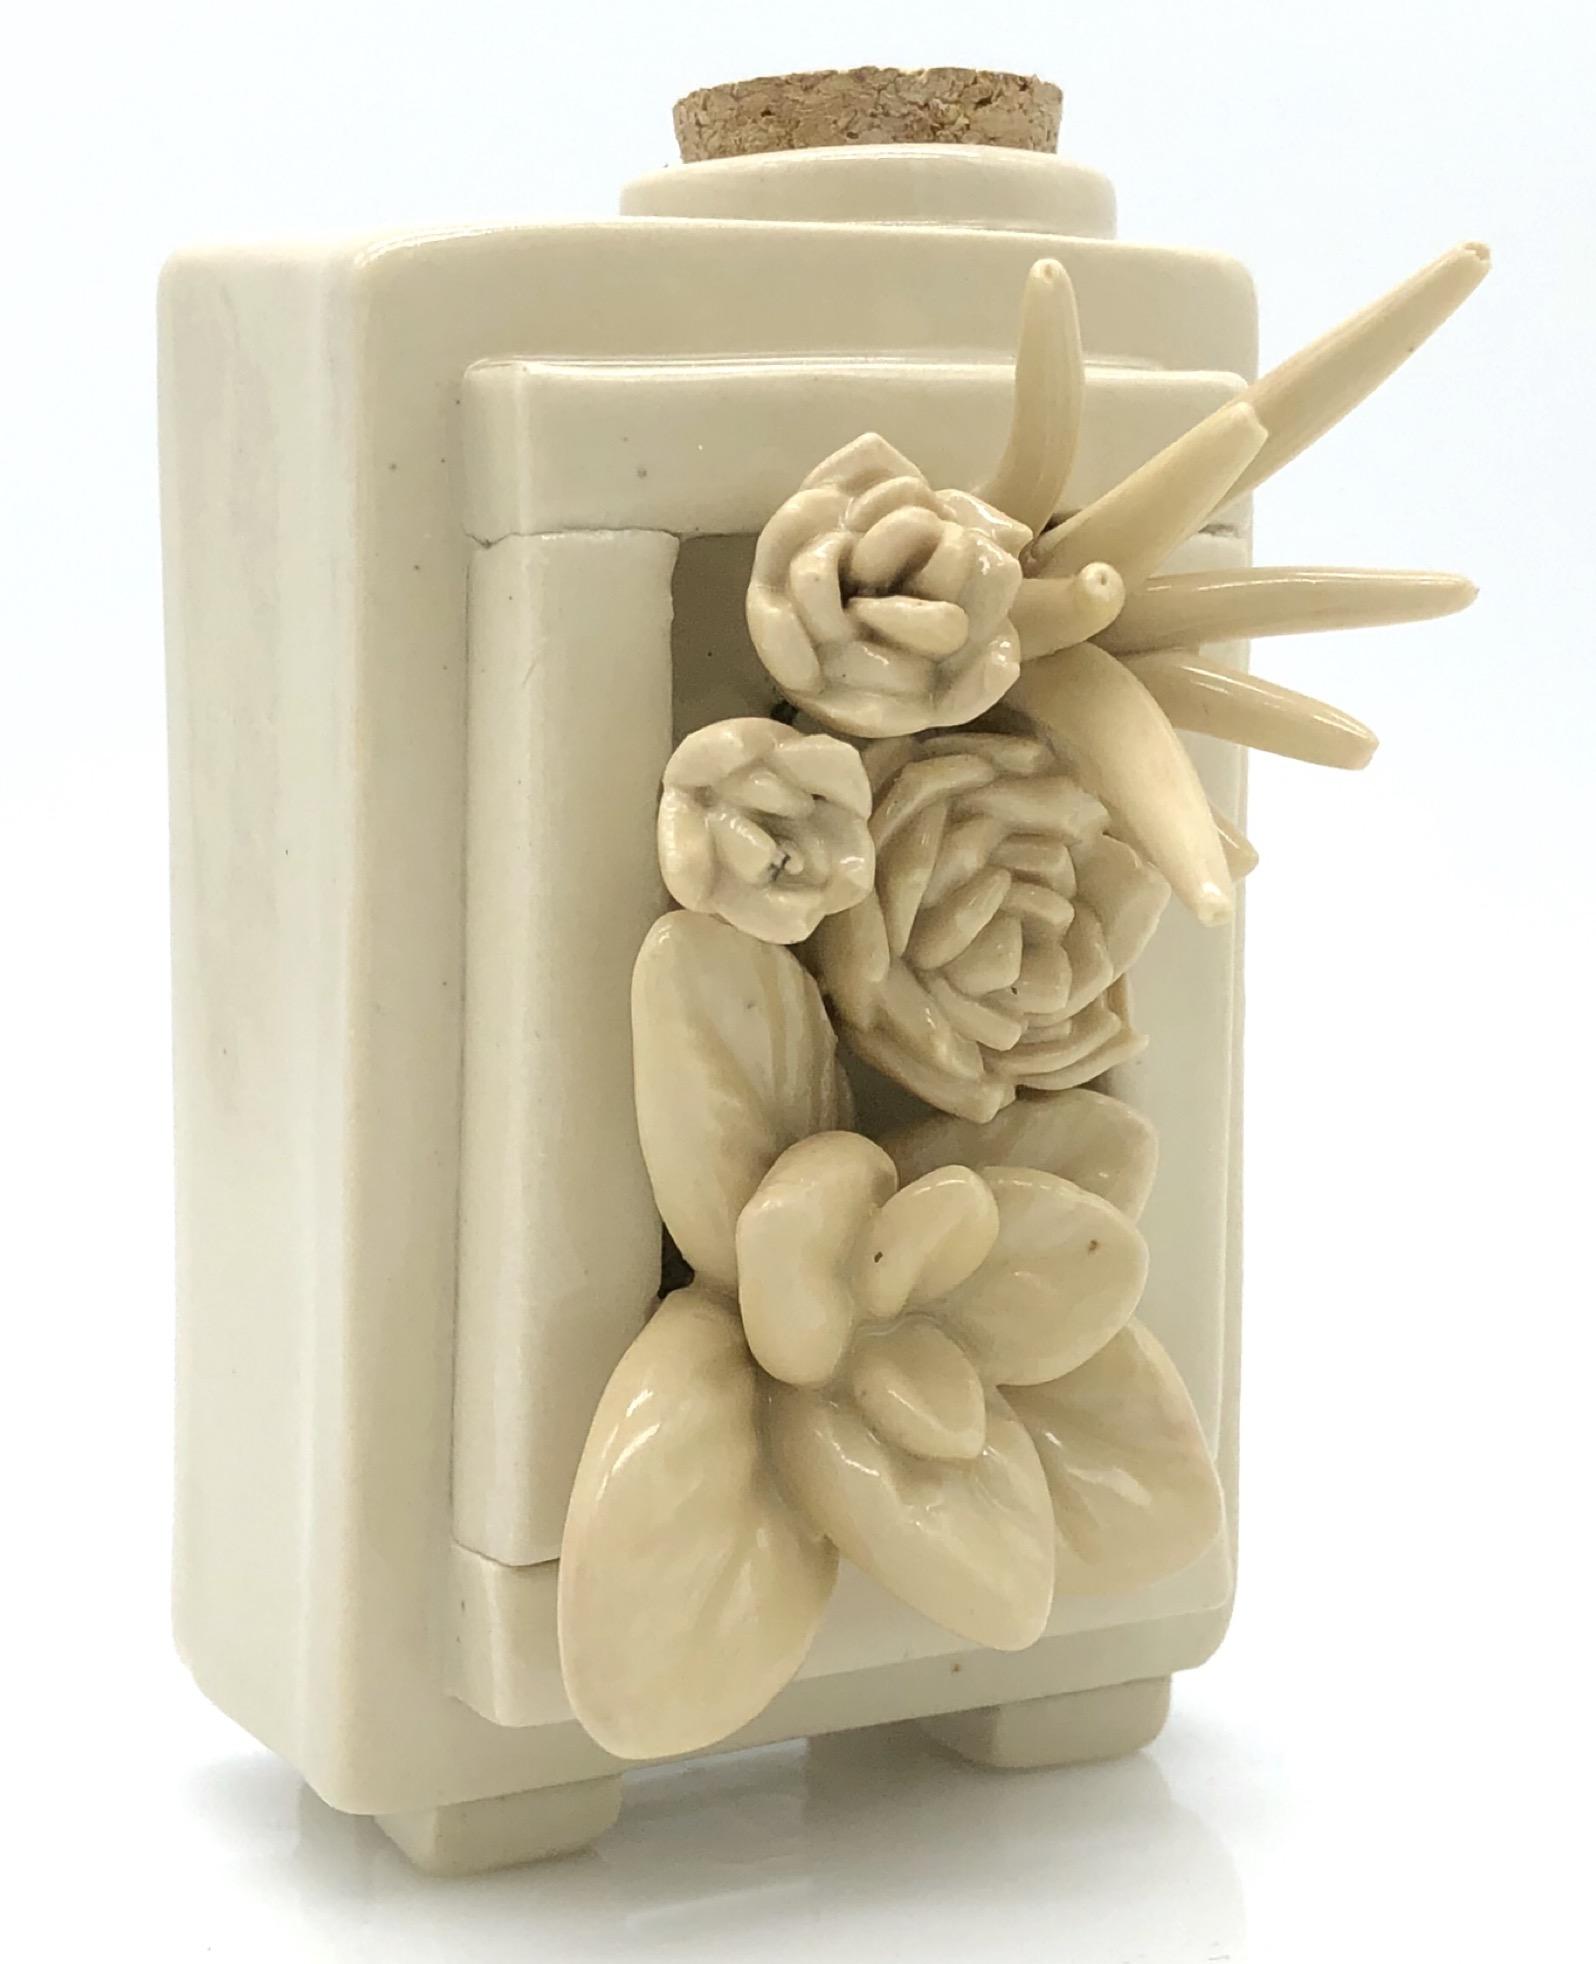 10_Planter_Box_Urn_In_Cream.JPG